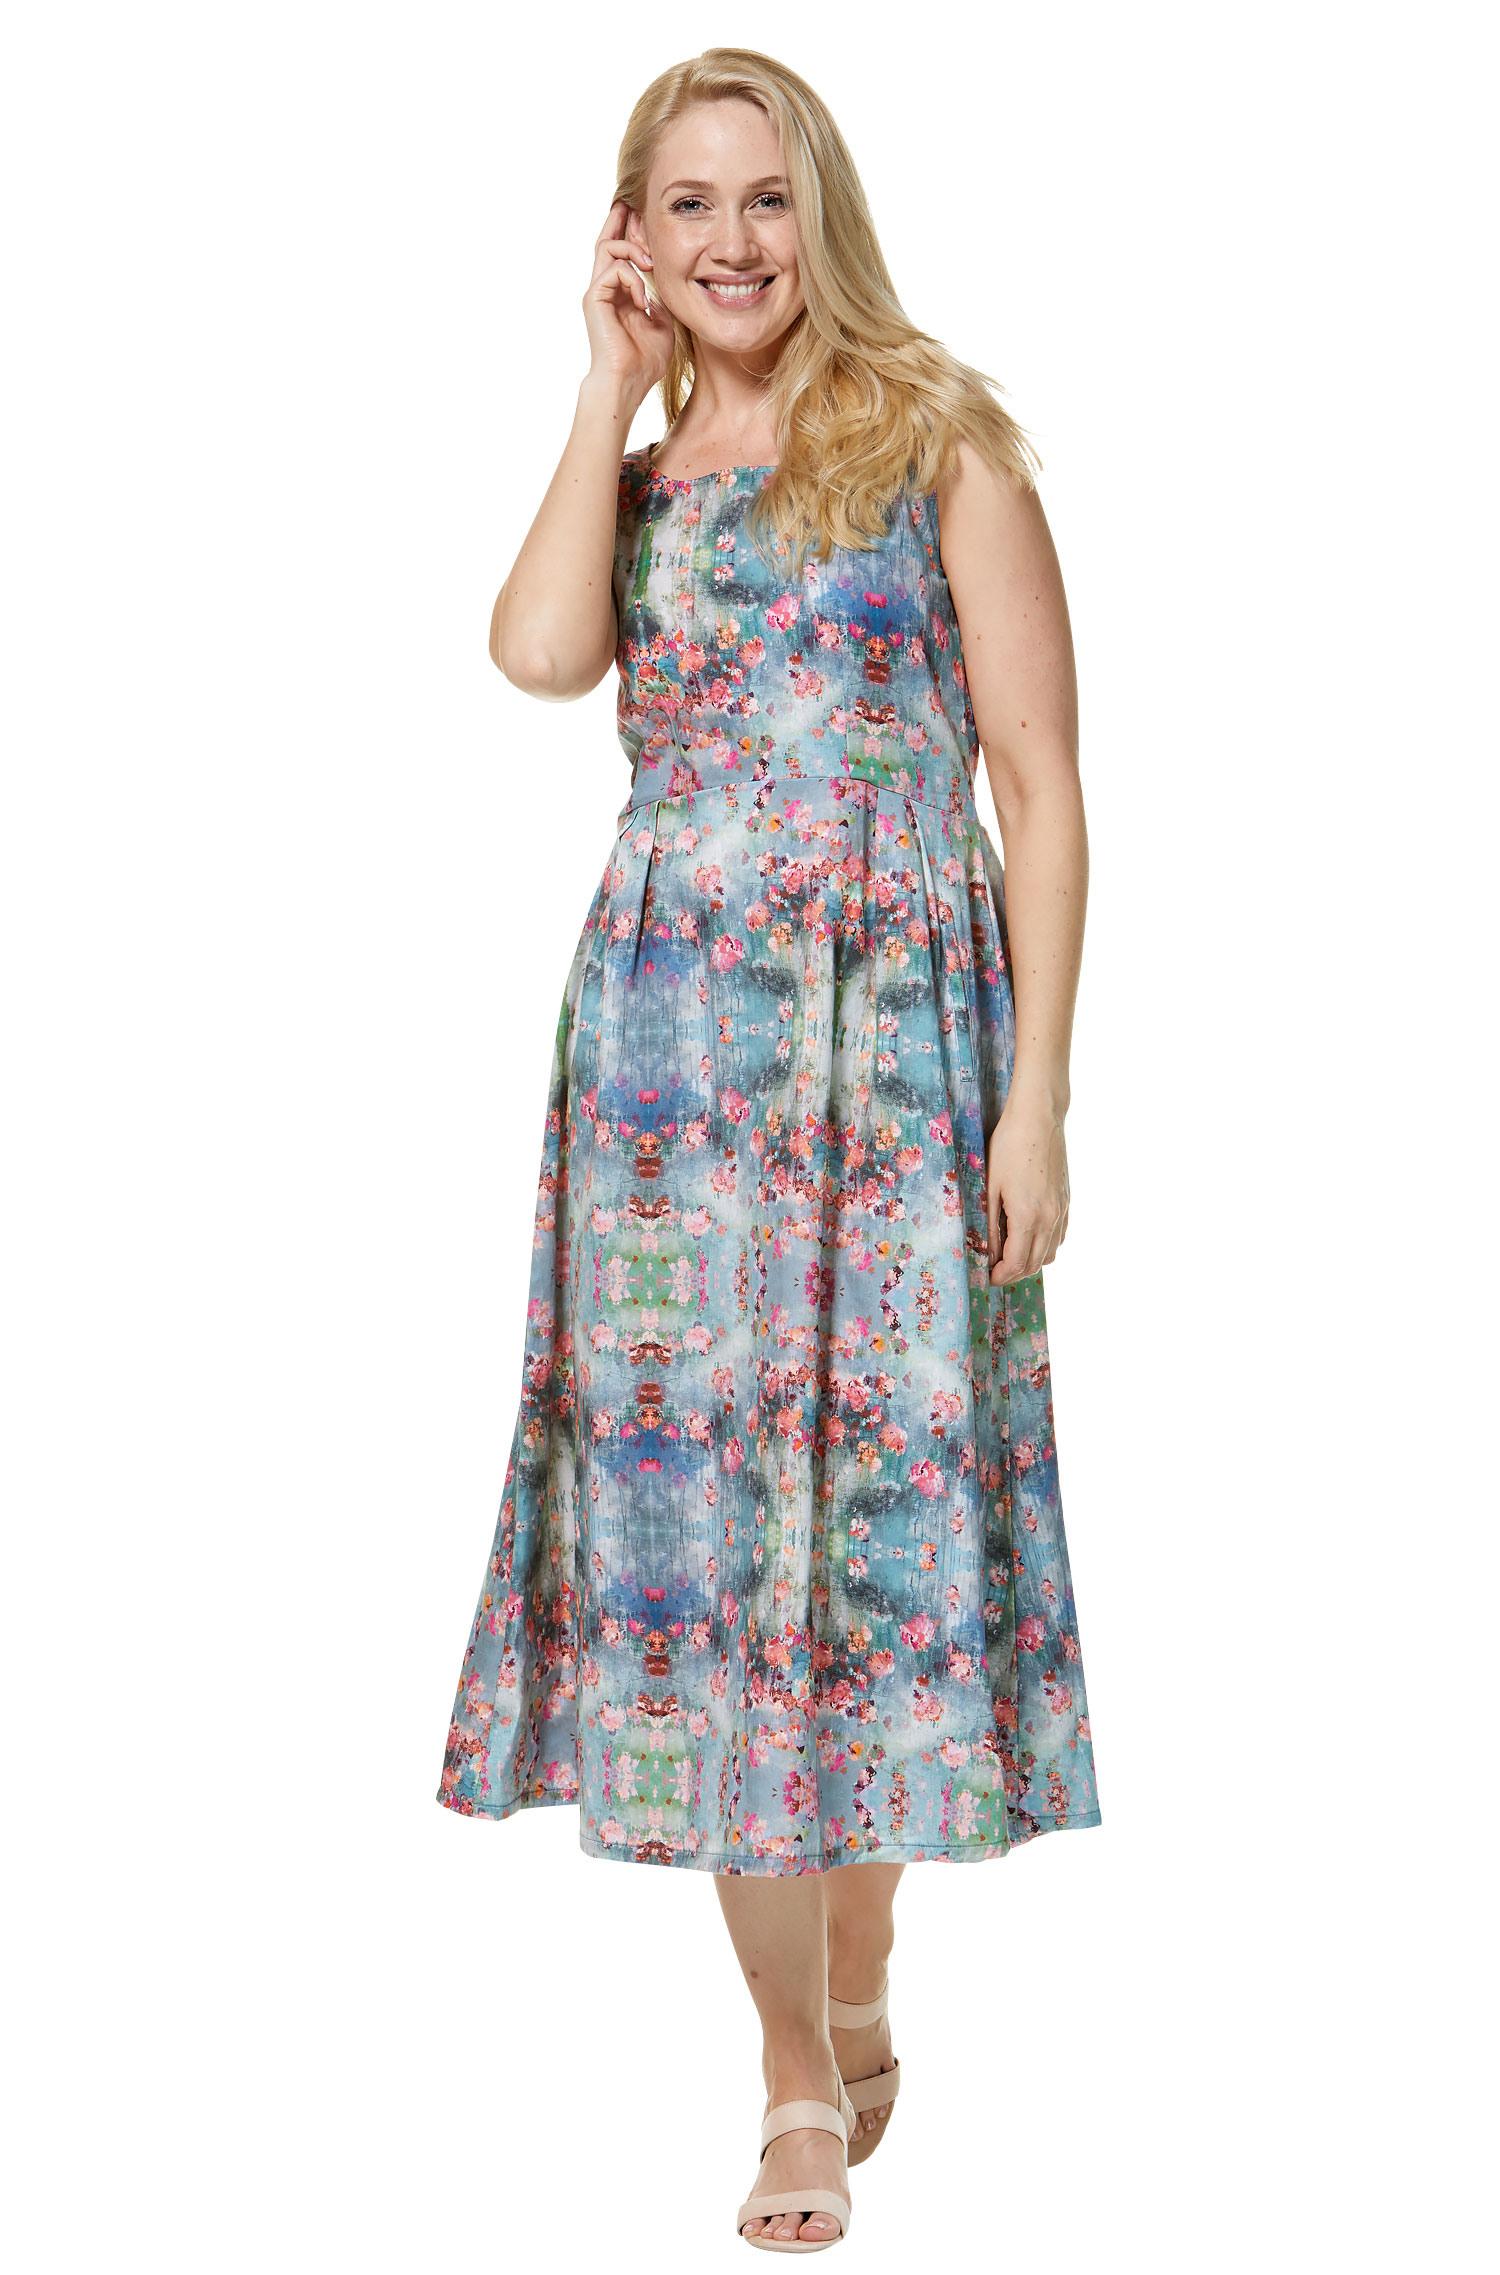 Designer Luxurius Kleider Midi Sommer Bester Preis17 Fantastisch Kleider Midi Sommer Ärmel